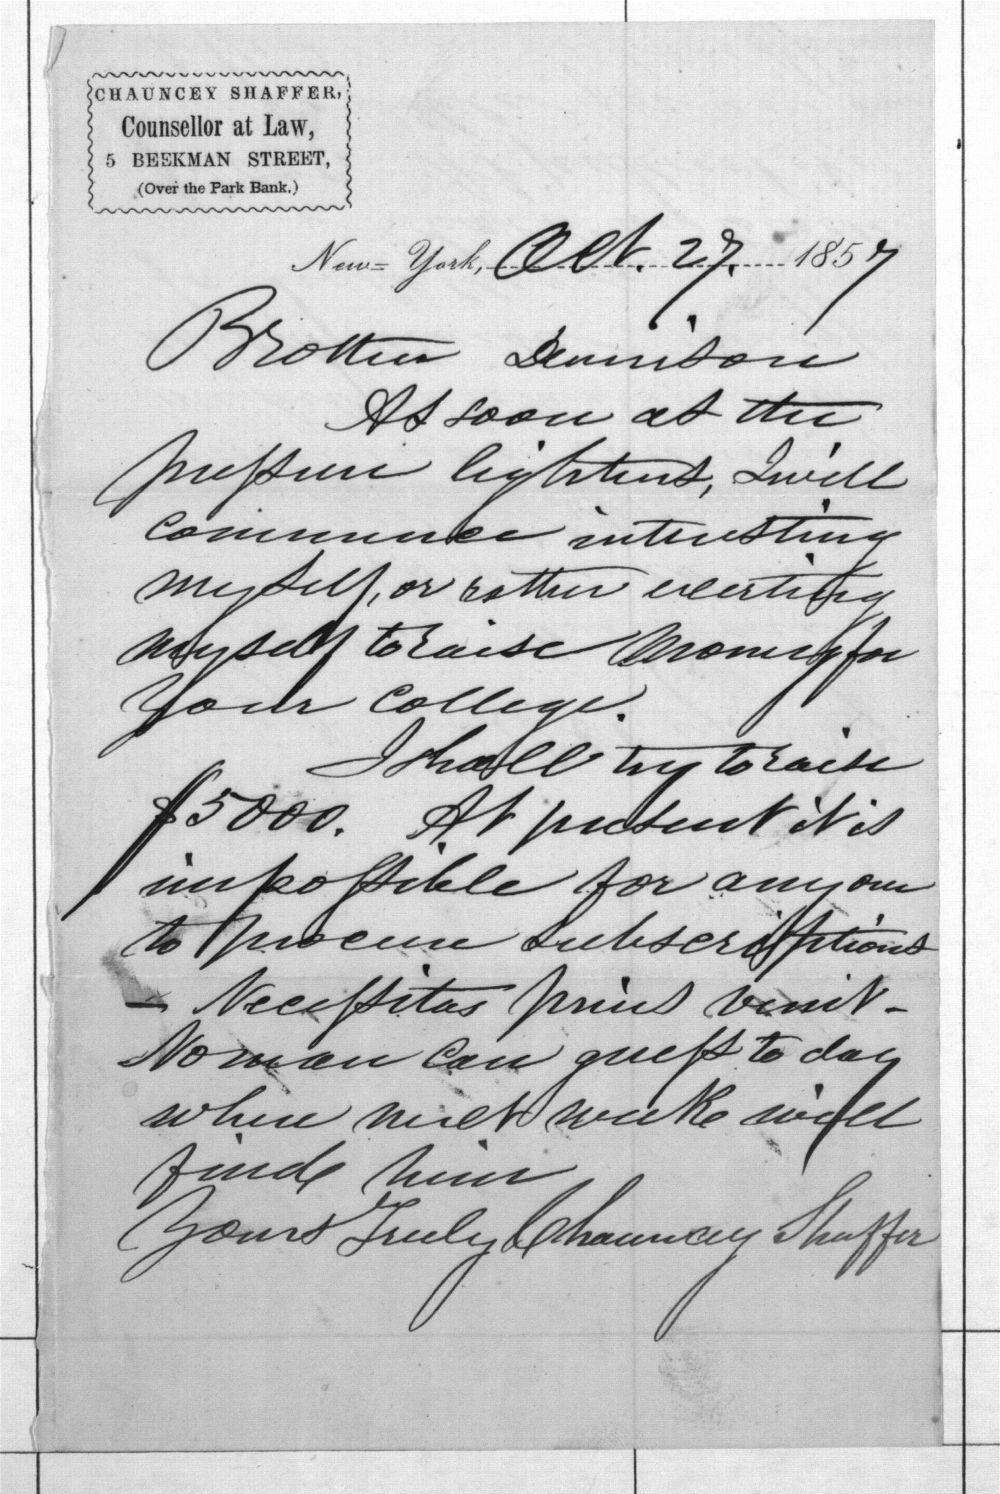 Chauncey Shaffer to Joseph Denison, 1857